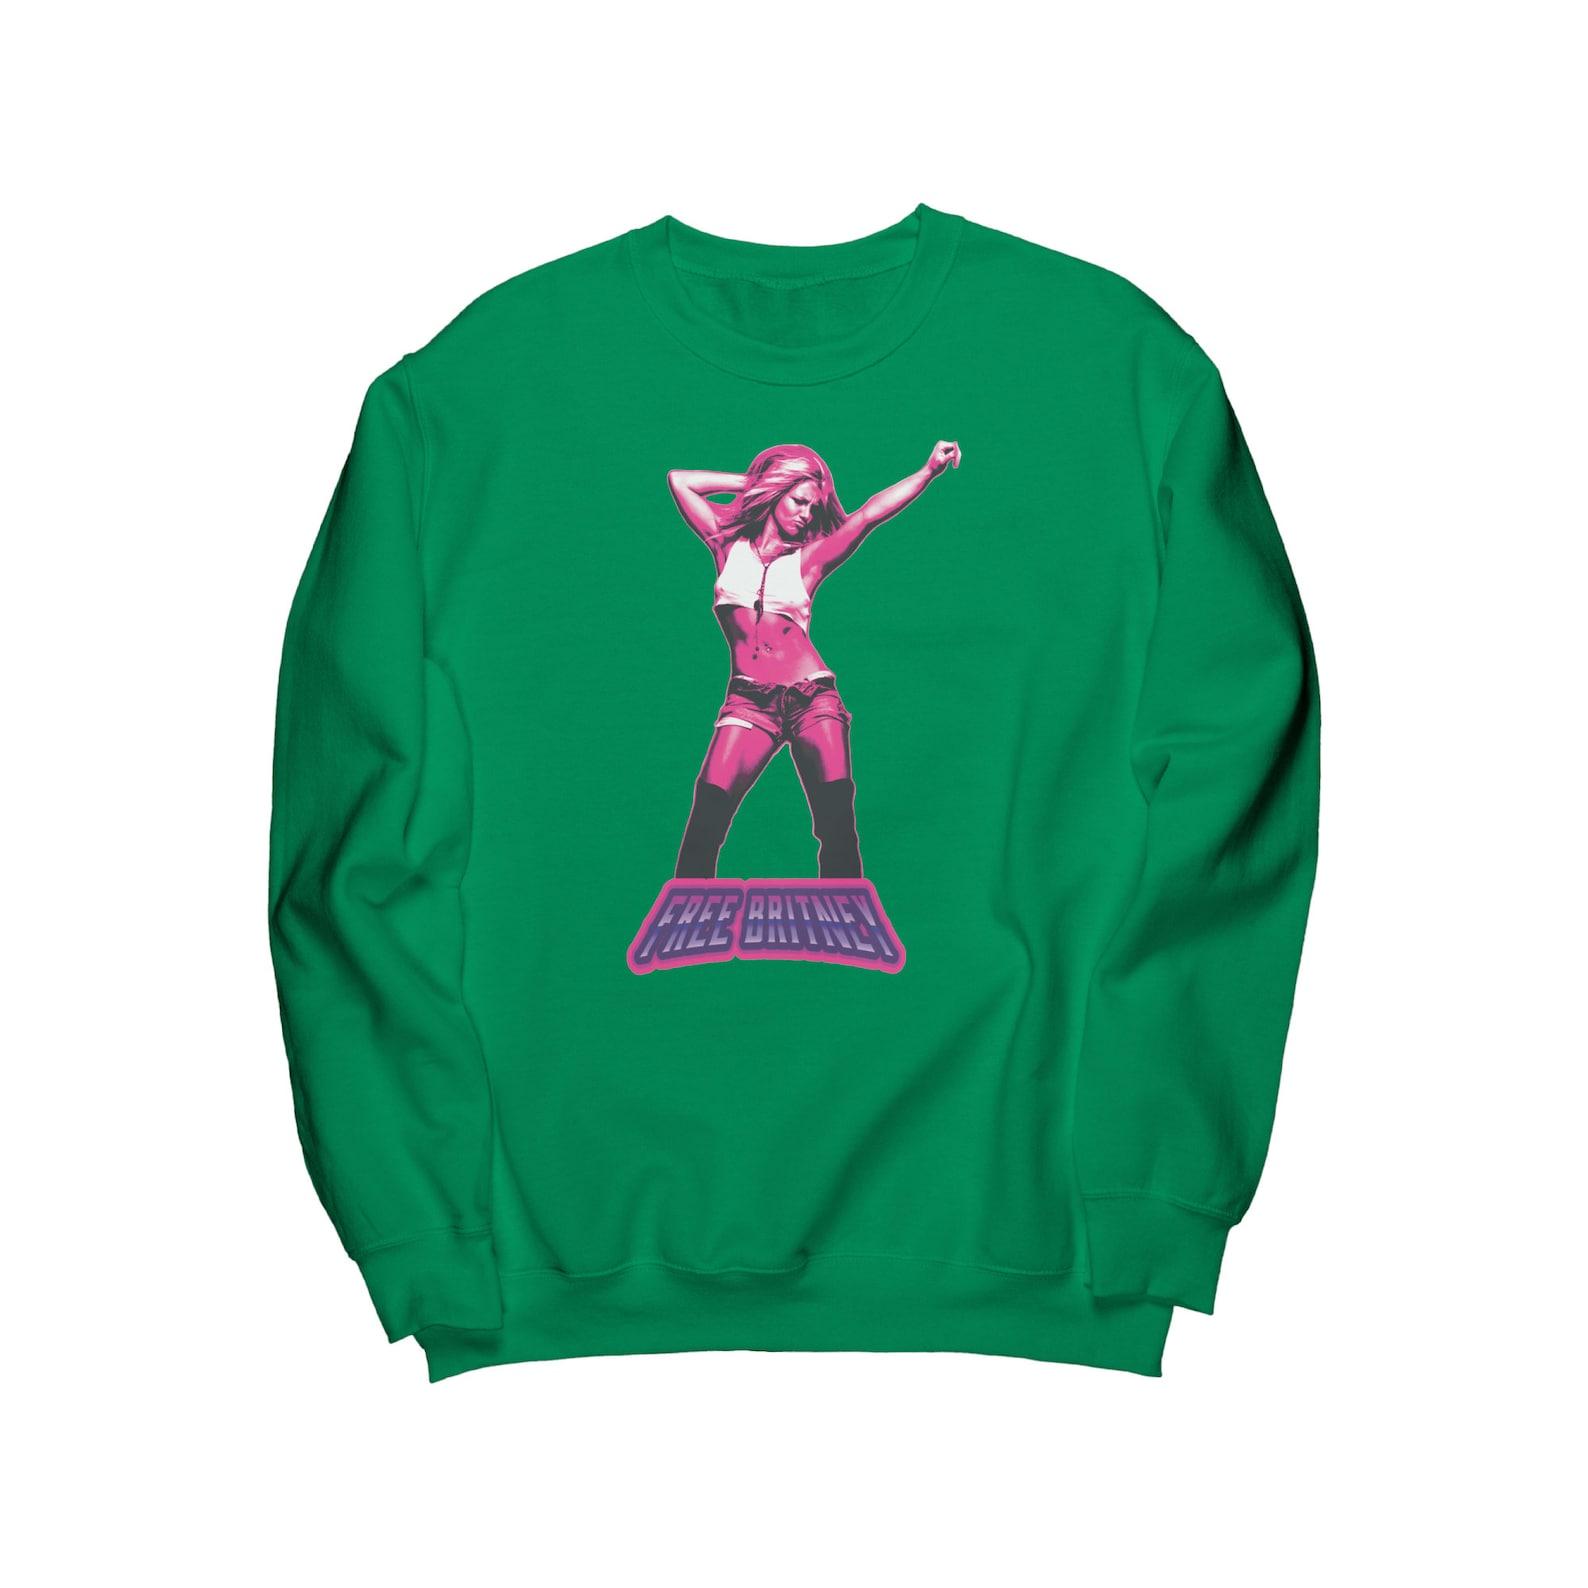 Kostenlose Britney Sweatshirt Britney Spears Shirt Gays | Etsy